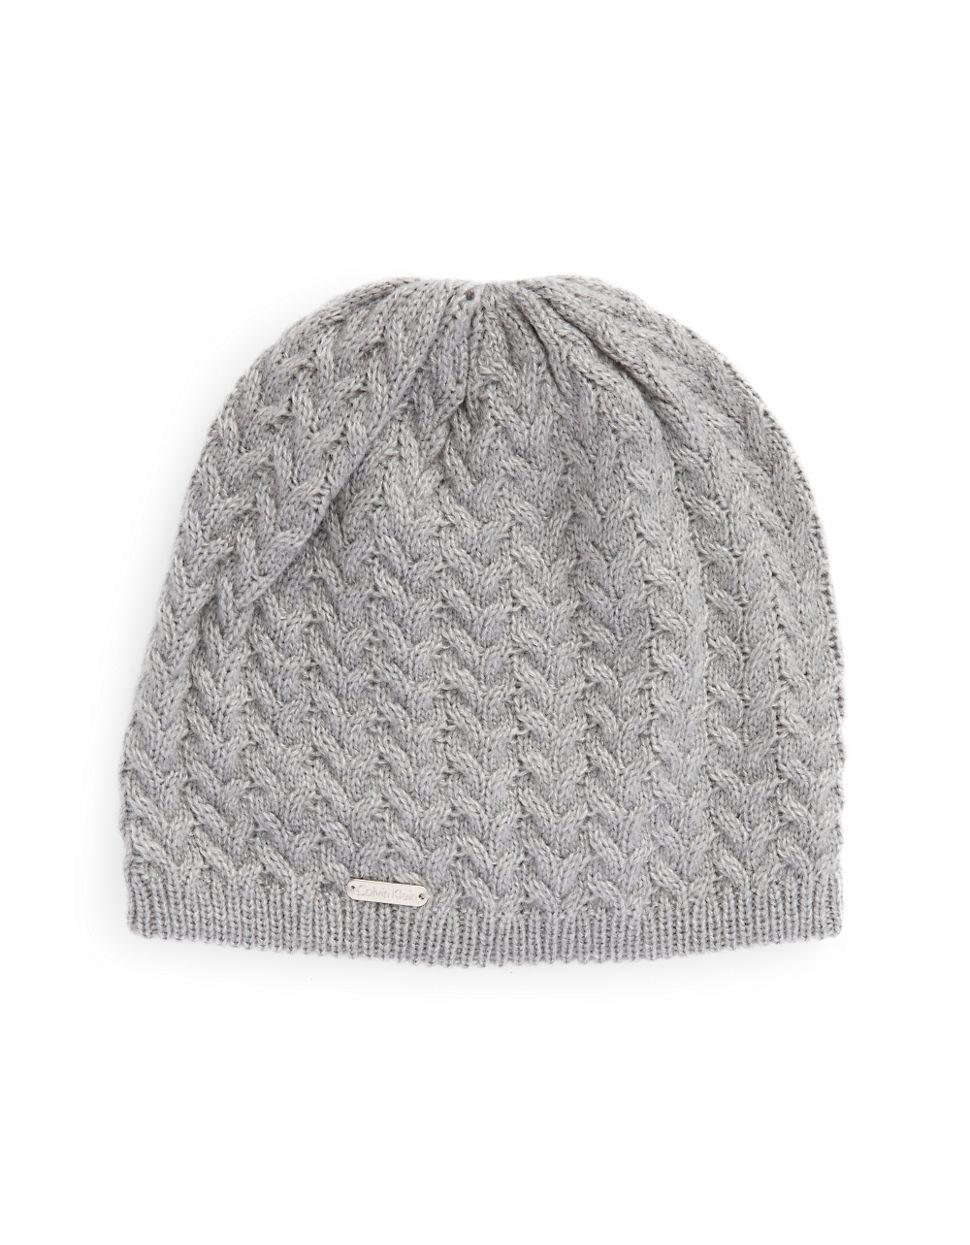 Calvin Klein Cable Knit Beanie in Gray - Lyst 0ddd2e9c5fc